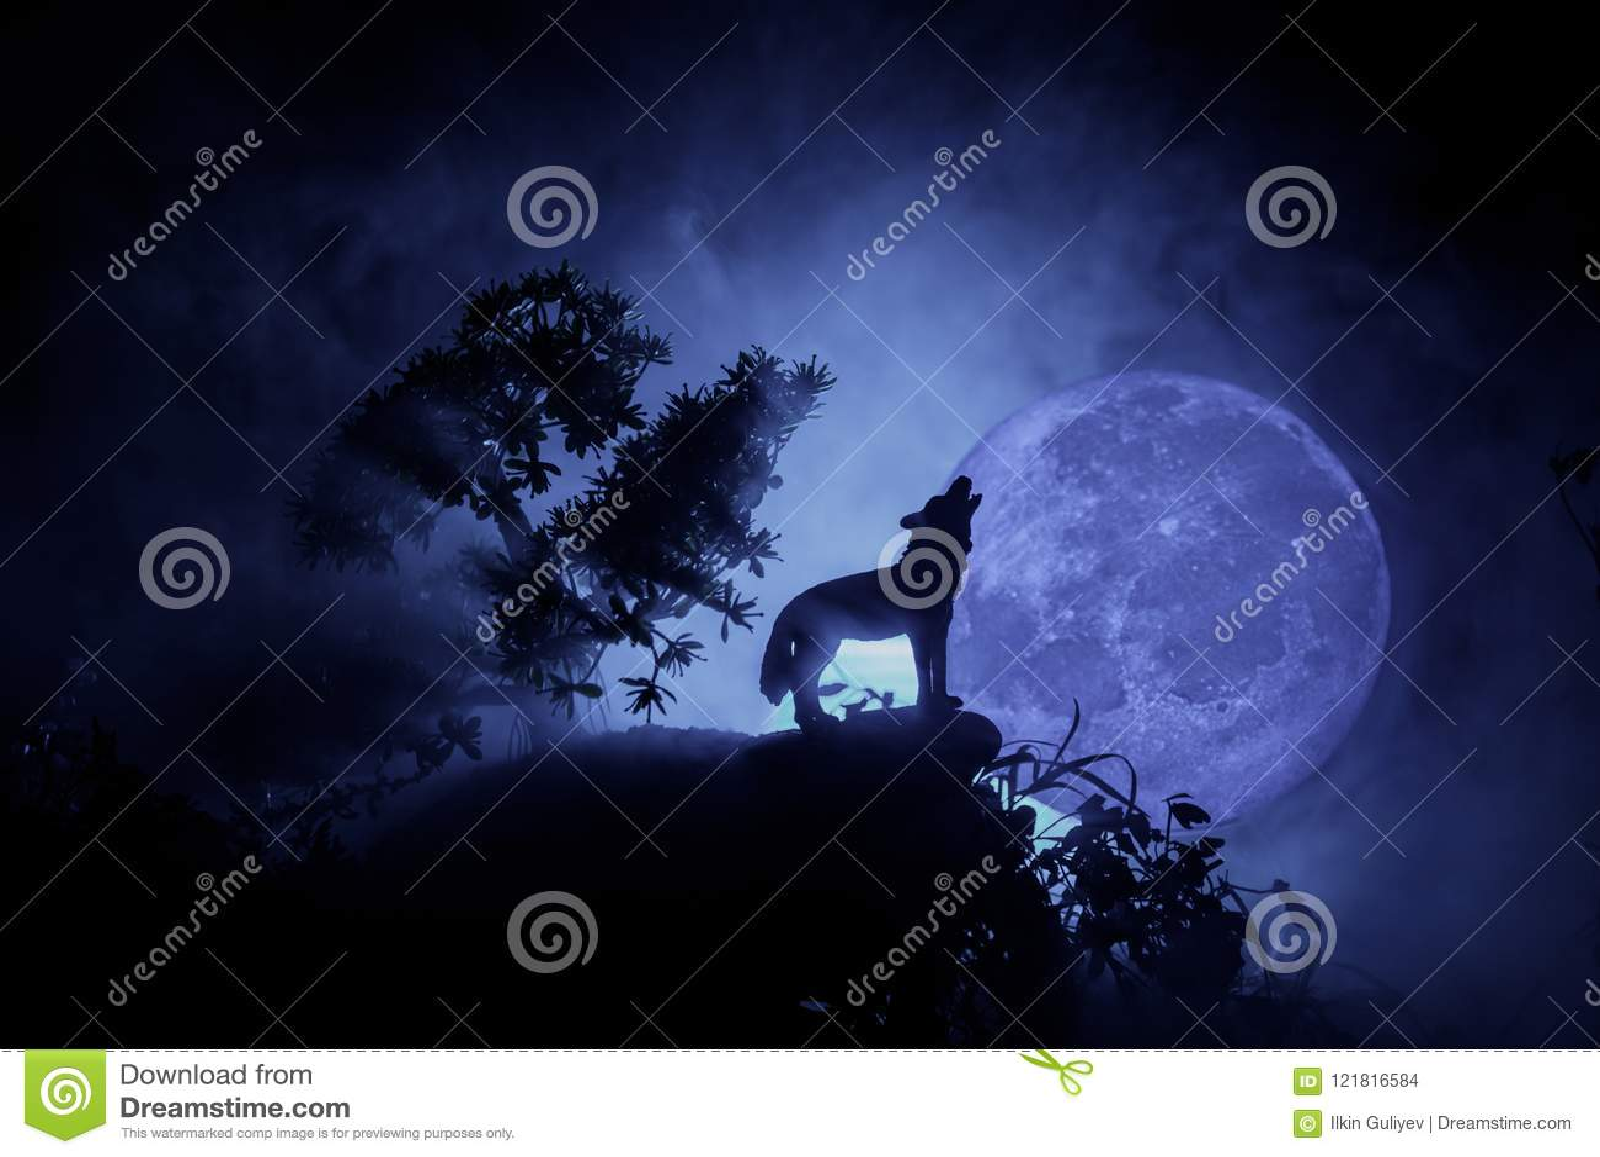 Silhueta do lobo do urro contra o fundo escuro e Lua cheia ou lobo nevoento tonificado na silhueta que urram ao máximo a lua hall